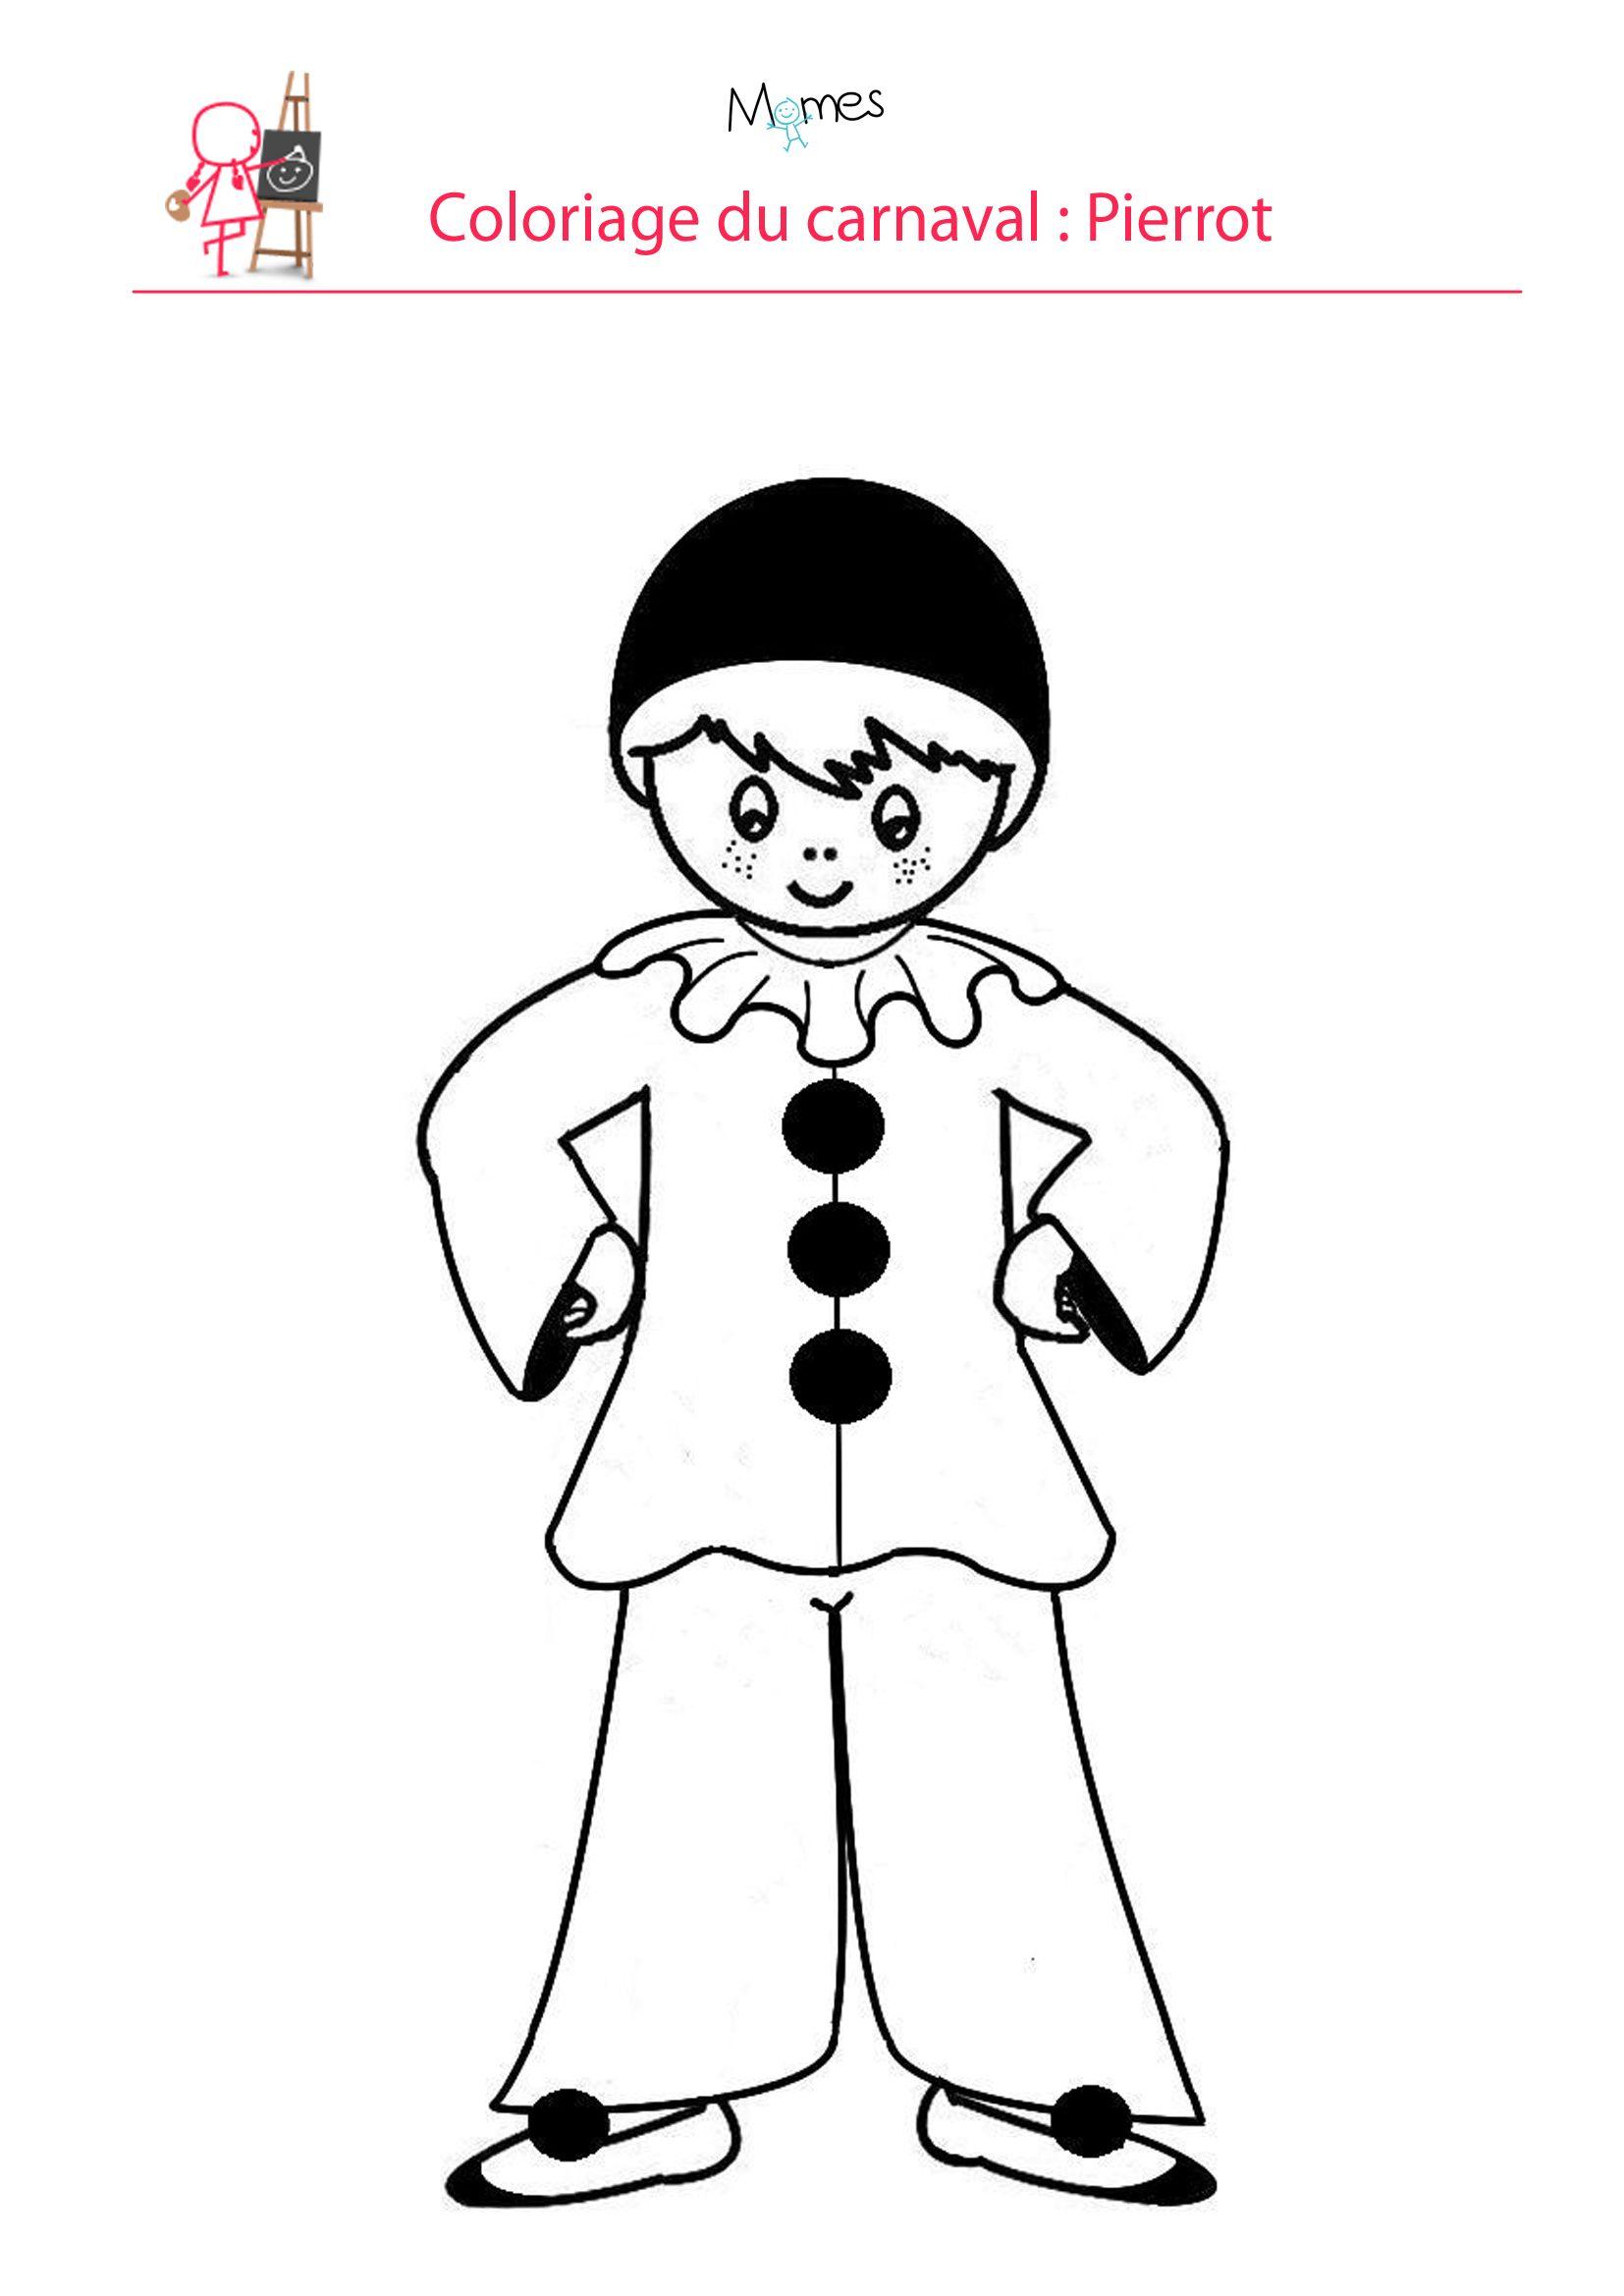 Coloriage Pierrot  Coloriage carnaval, Coloriage, Pierrot